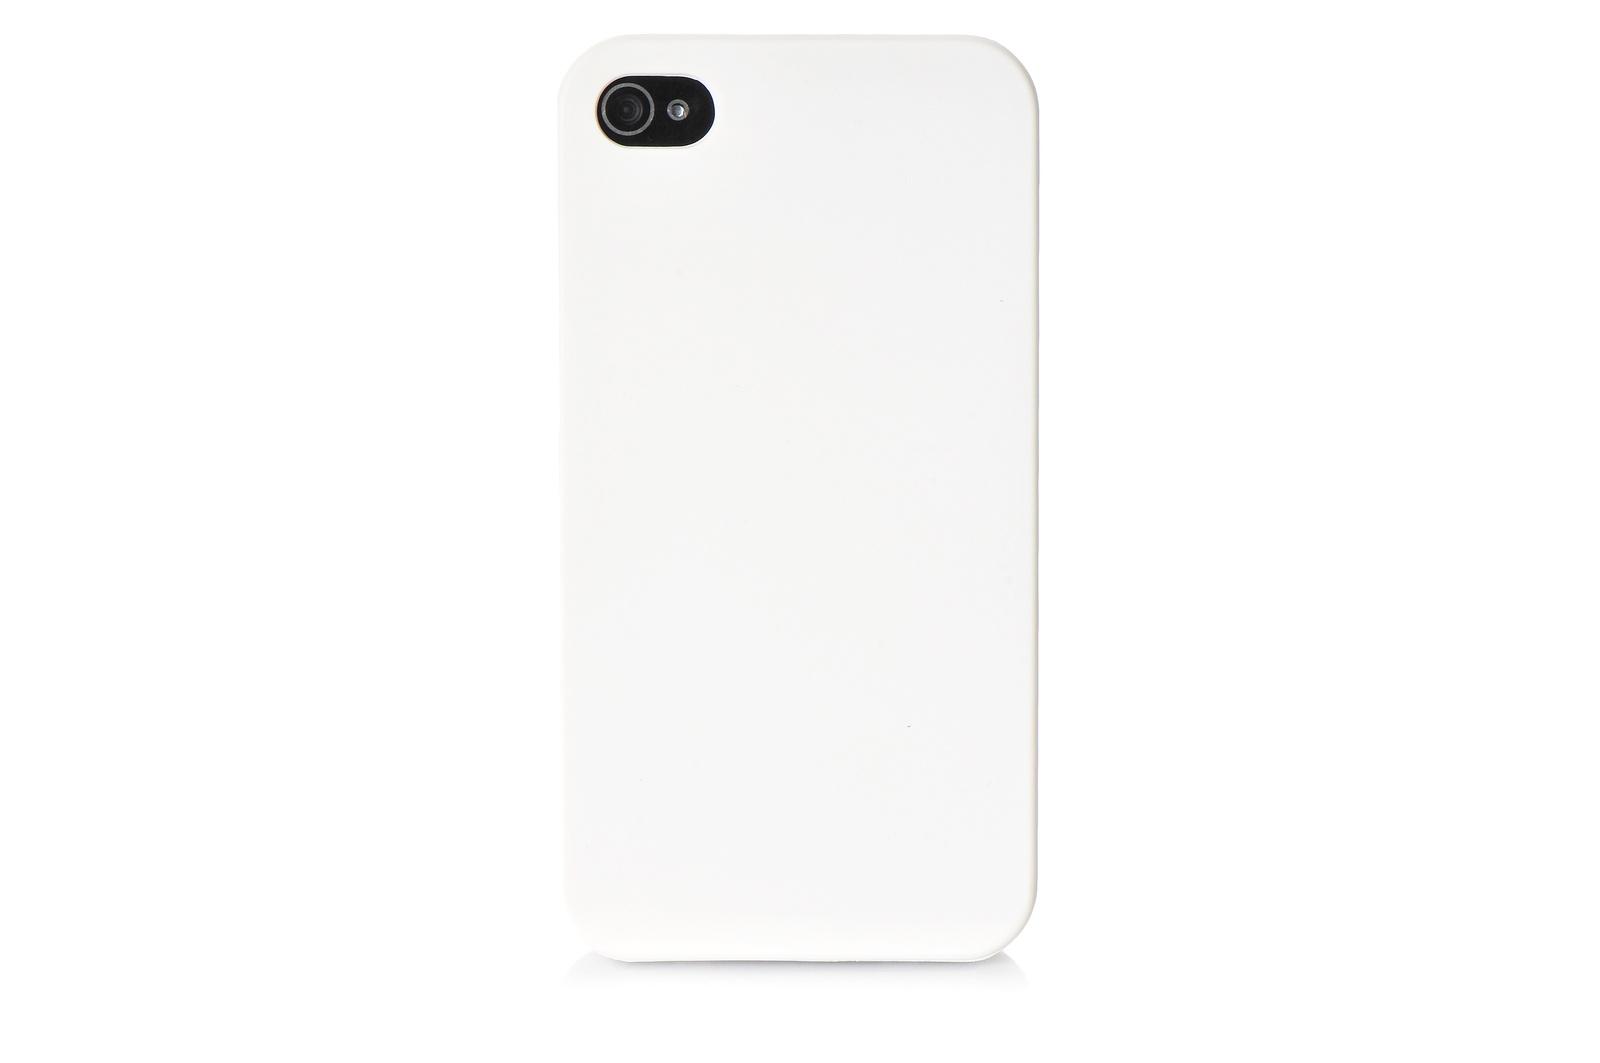 Чехол для сотового телефона No name Чехол накладка iPhone 4/4S пластик soft touch белый